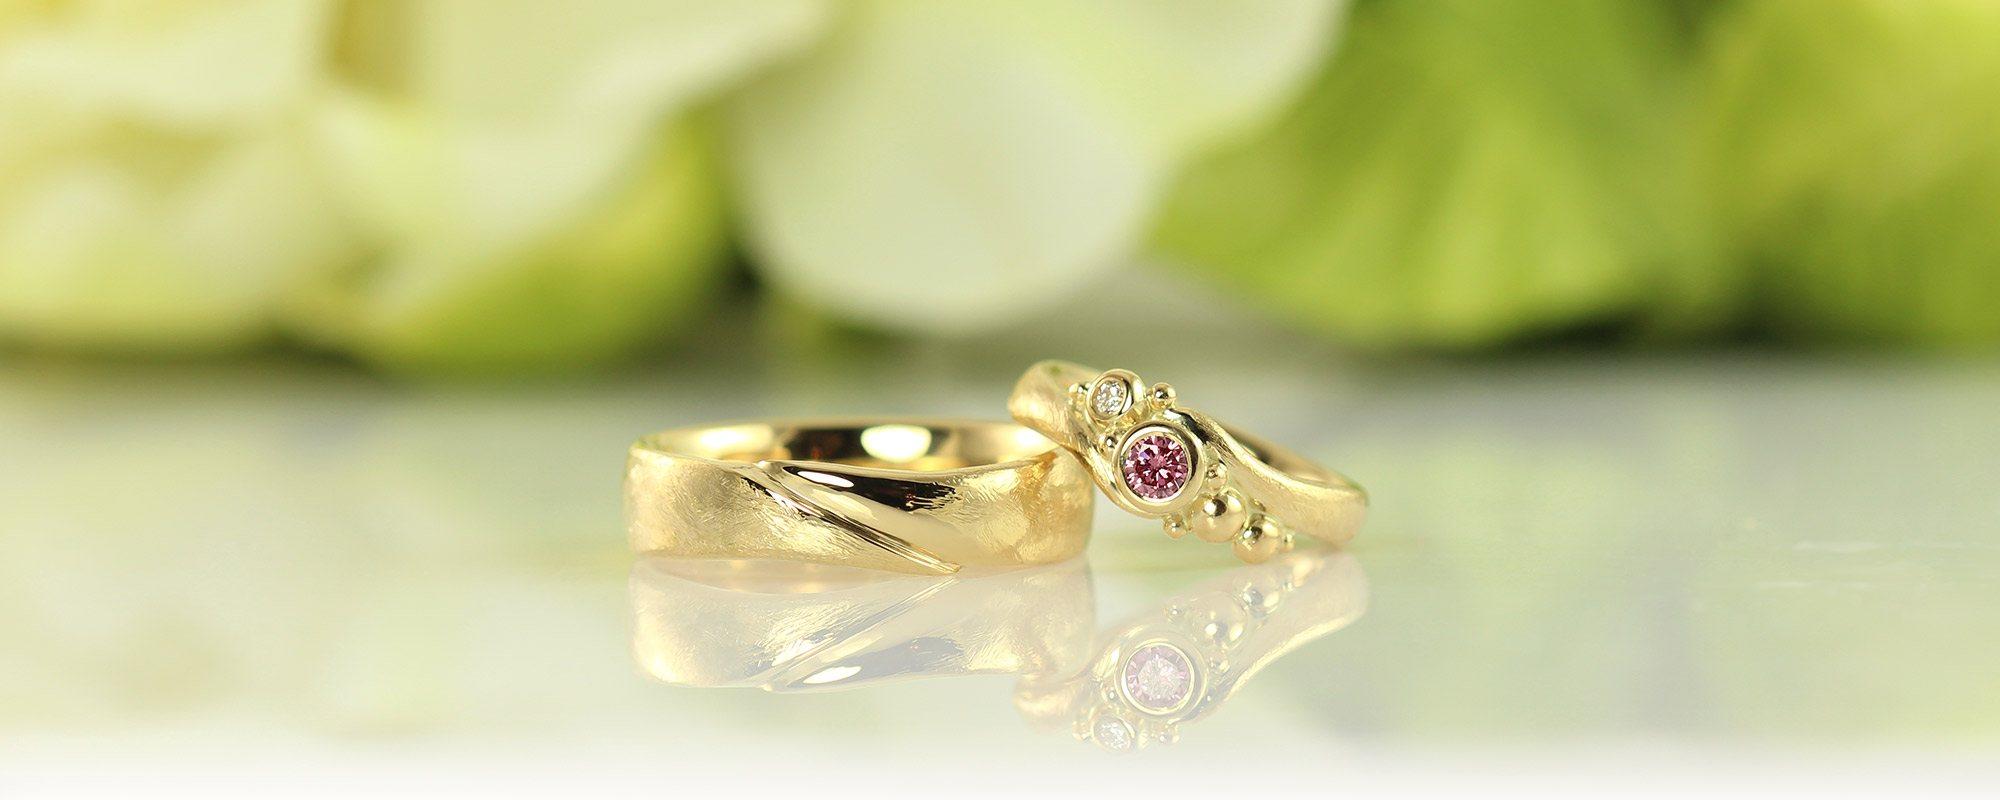 Håndlavede Vielsesringe Unikke Smykker Hos Castens Wedding Rings With Pink Diamond